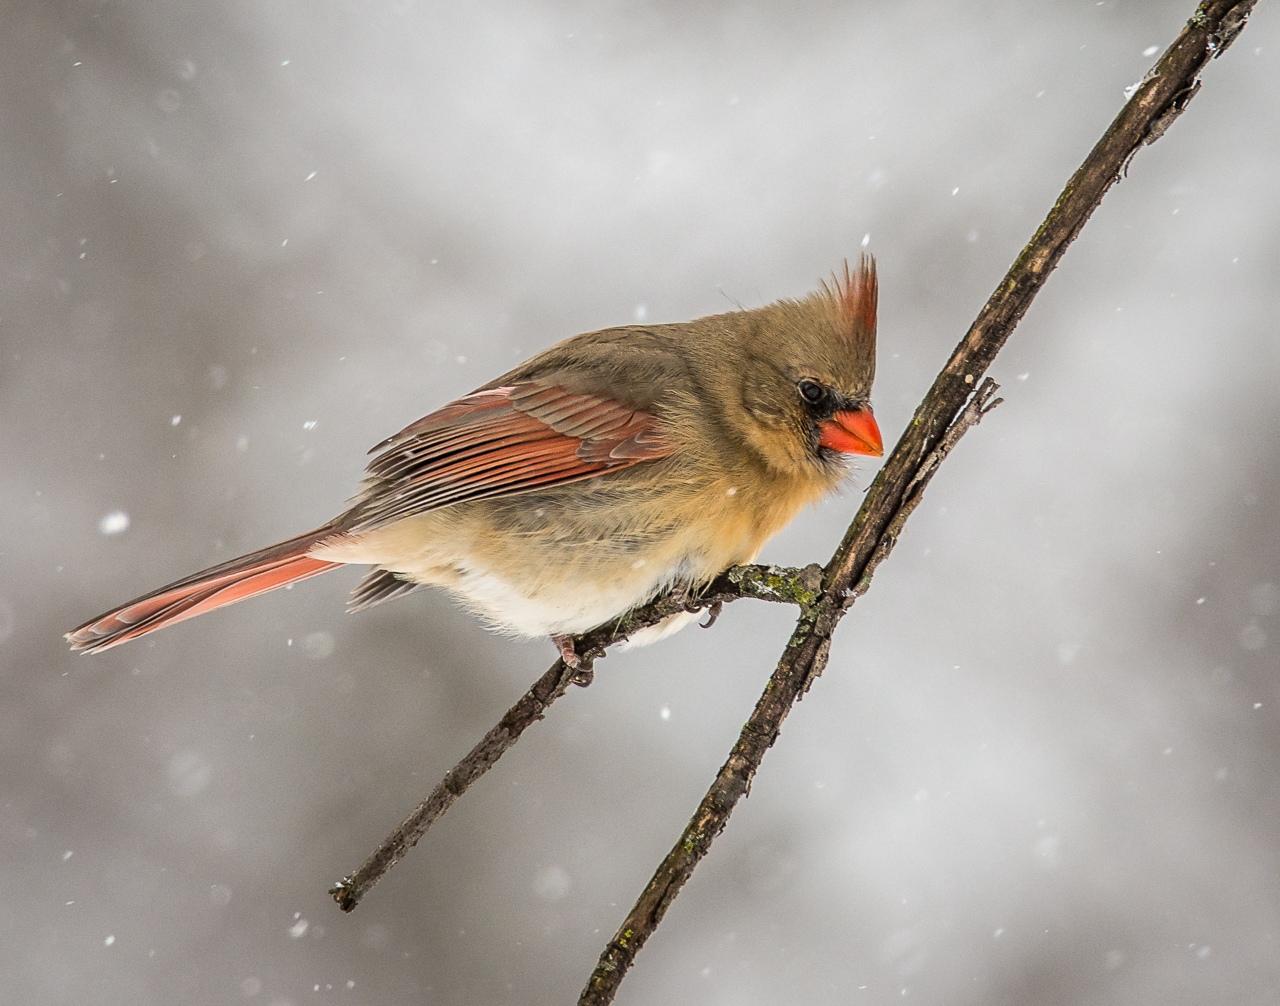 Female Cardinal in Snow - Scott Landseidel - MNPC